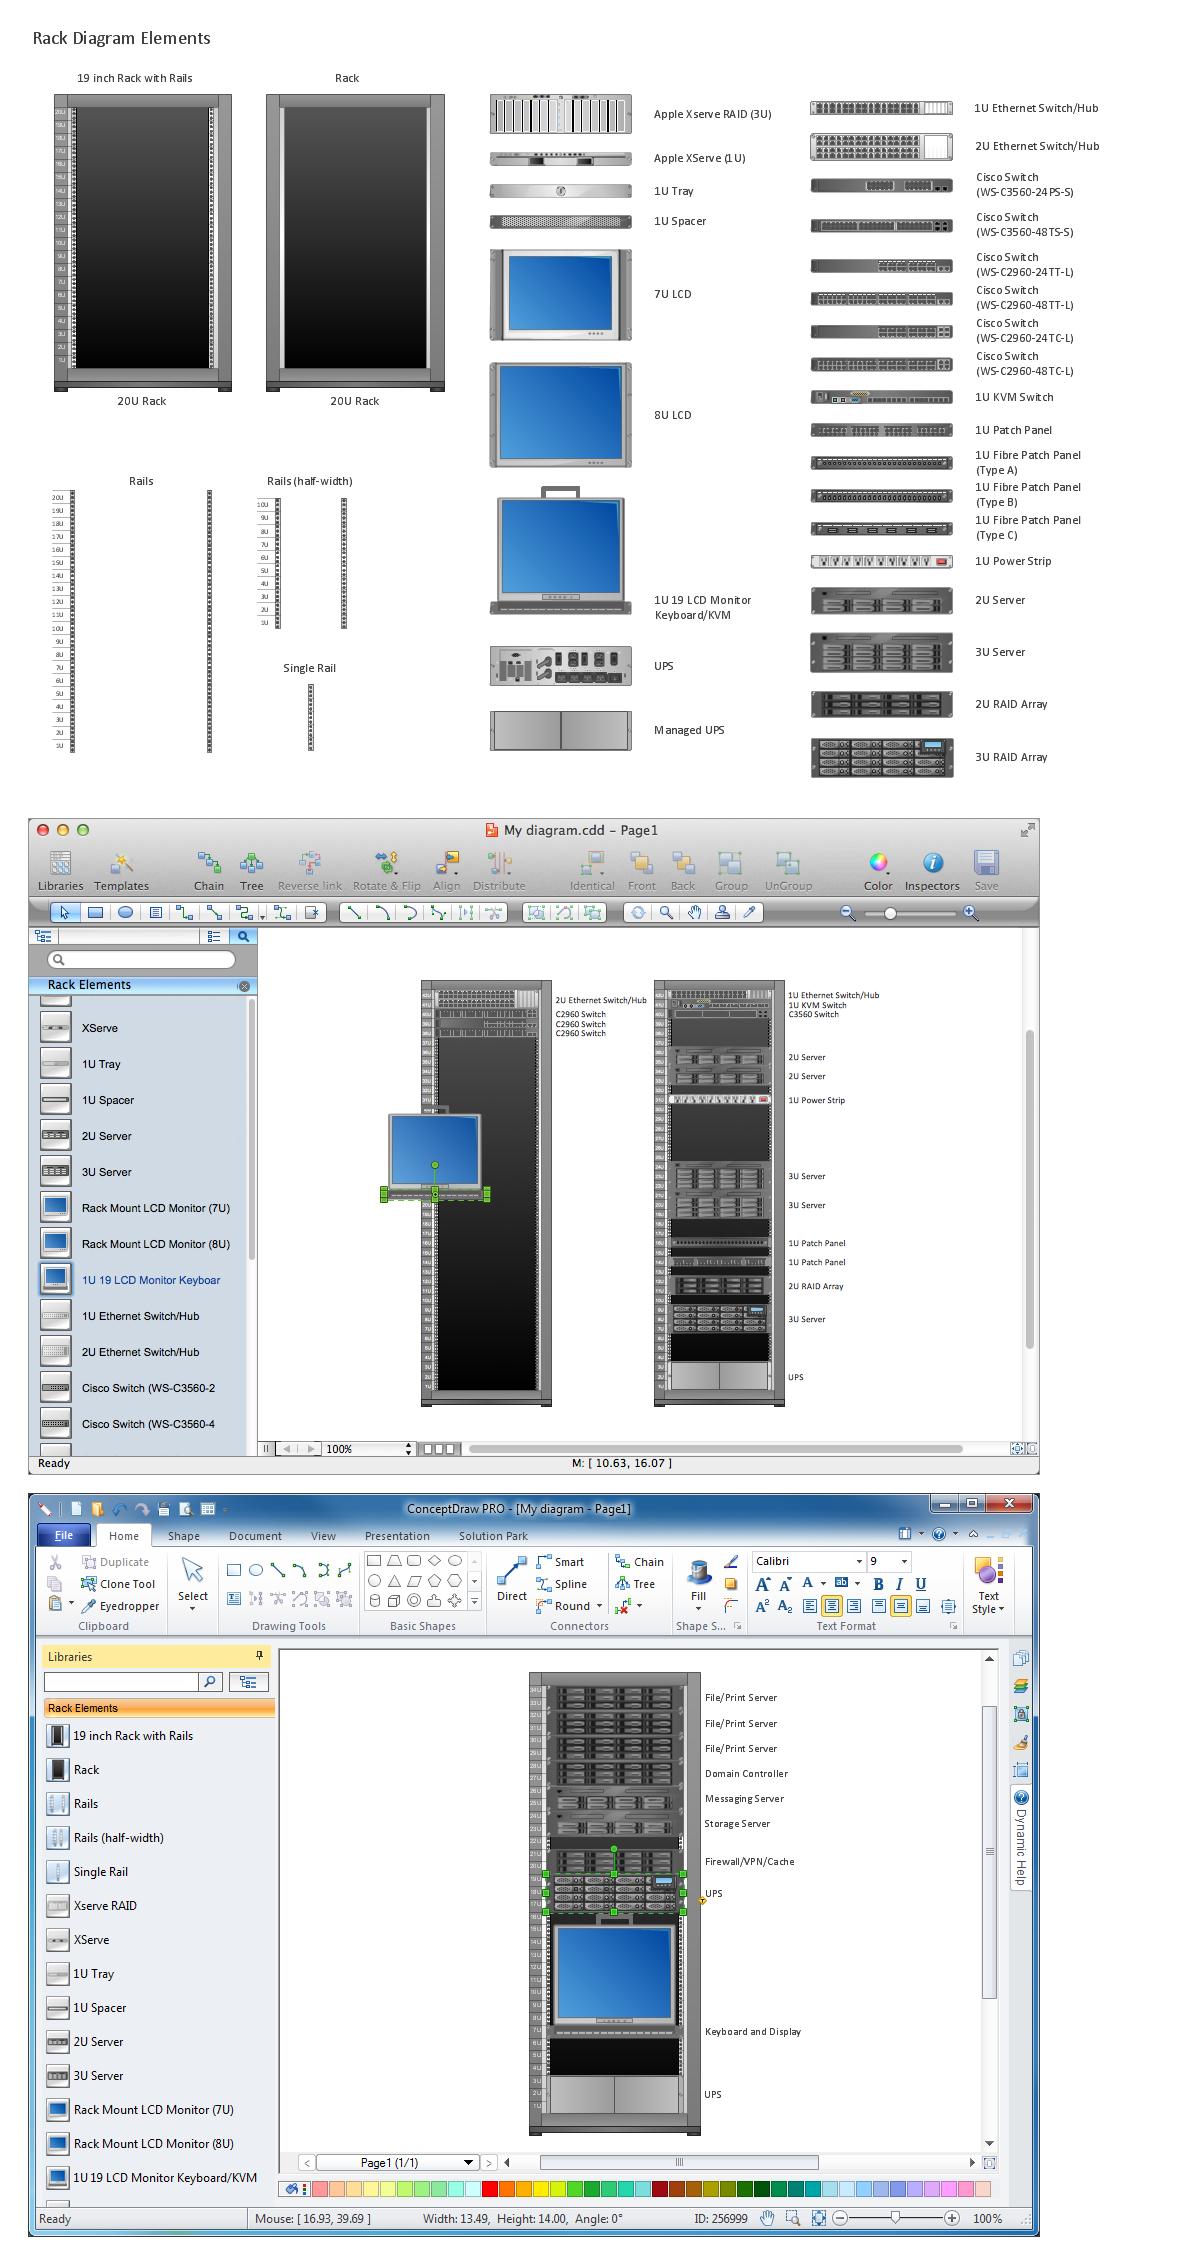 Network Diagramming Tools Design Element for Rack Diagram